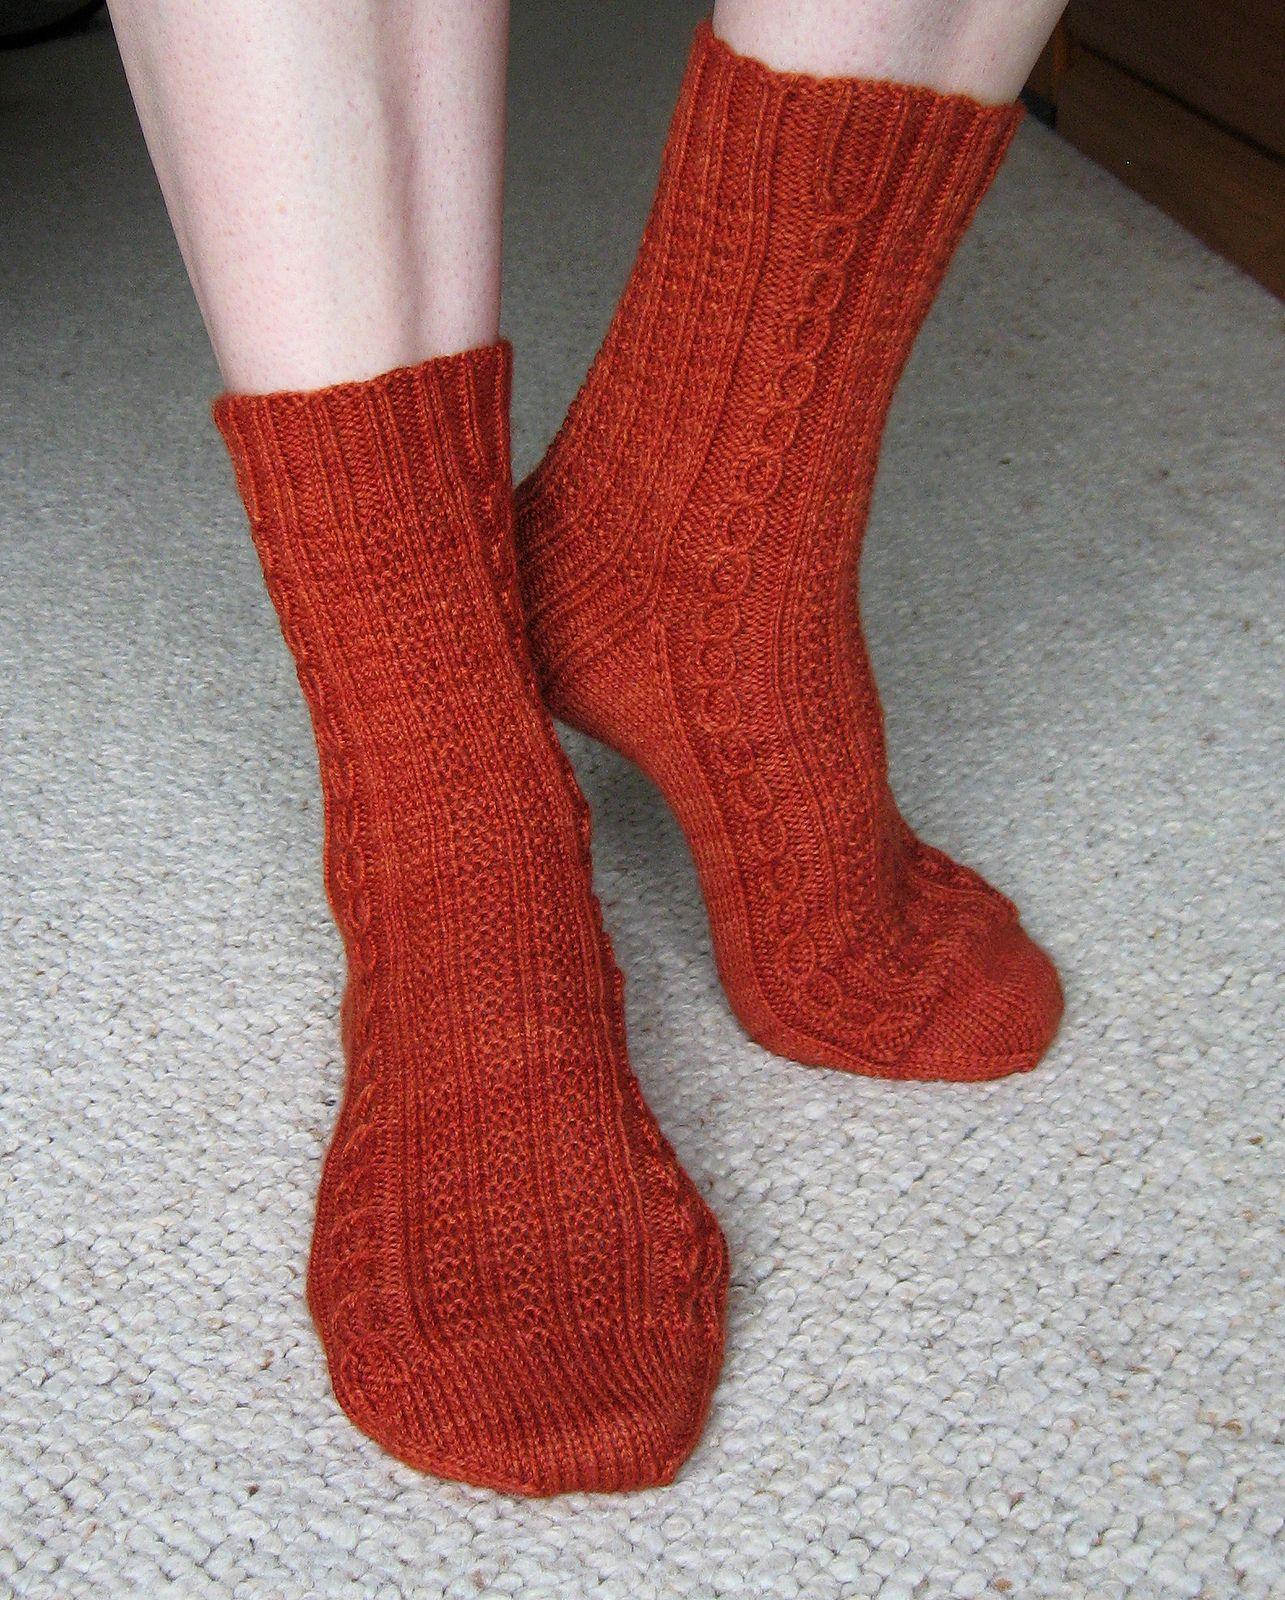 Kellebeck Socks pattern by Jo-Anne Klim | Ravelry, Socks and Patterns